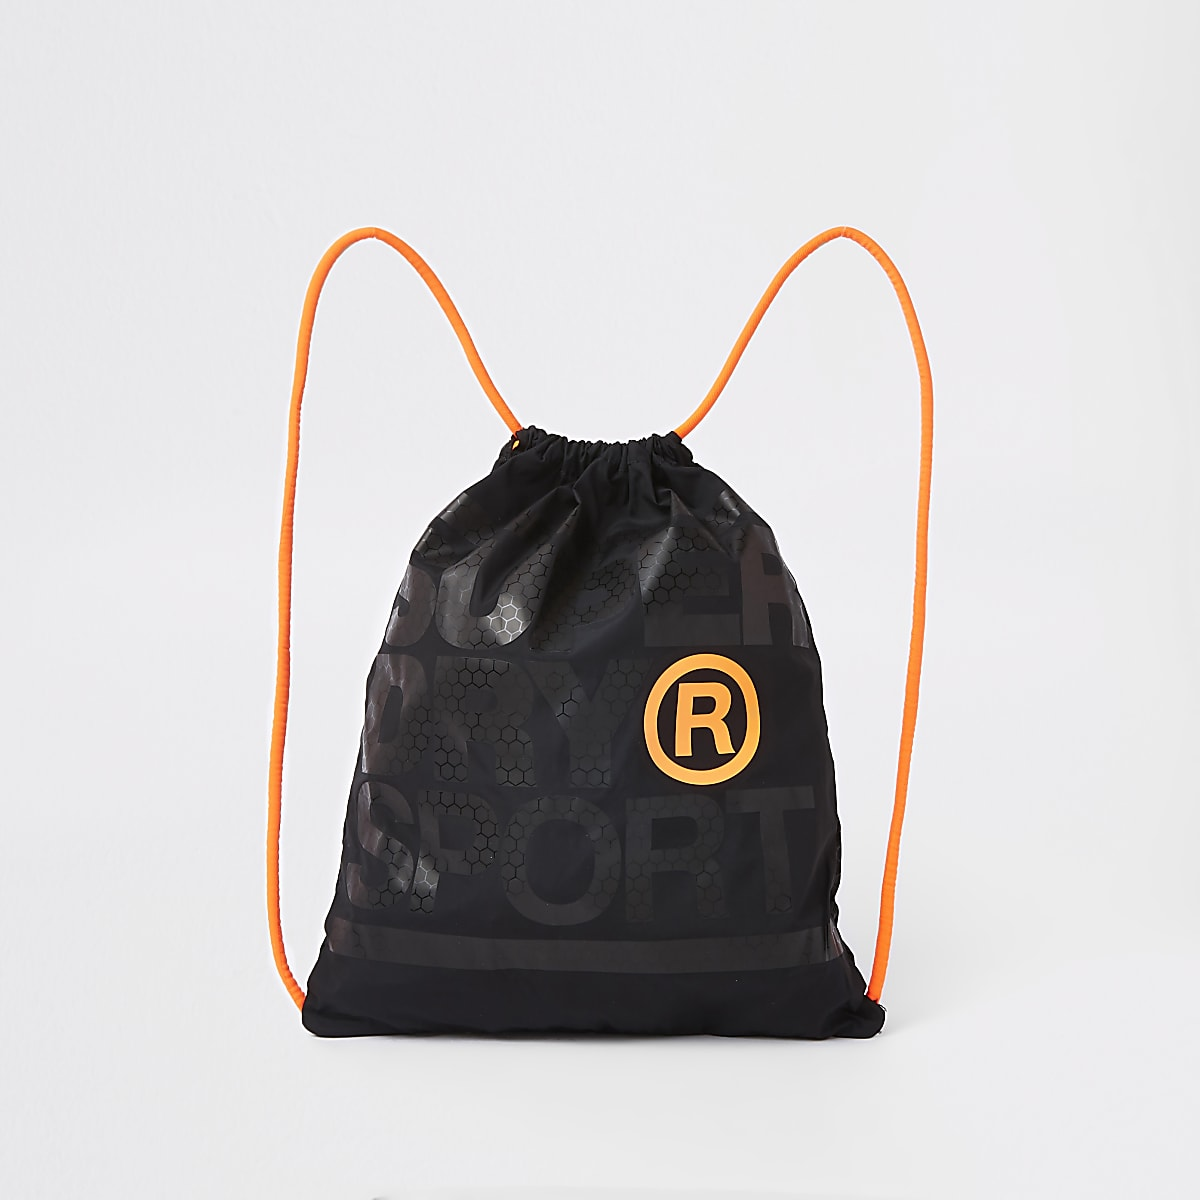 Superdry black logo print drawstring bag